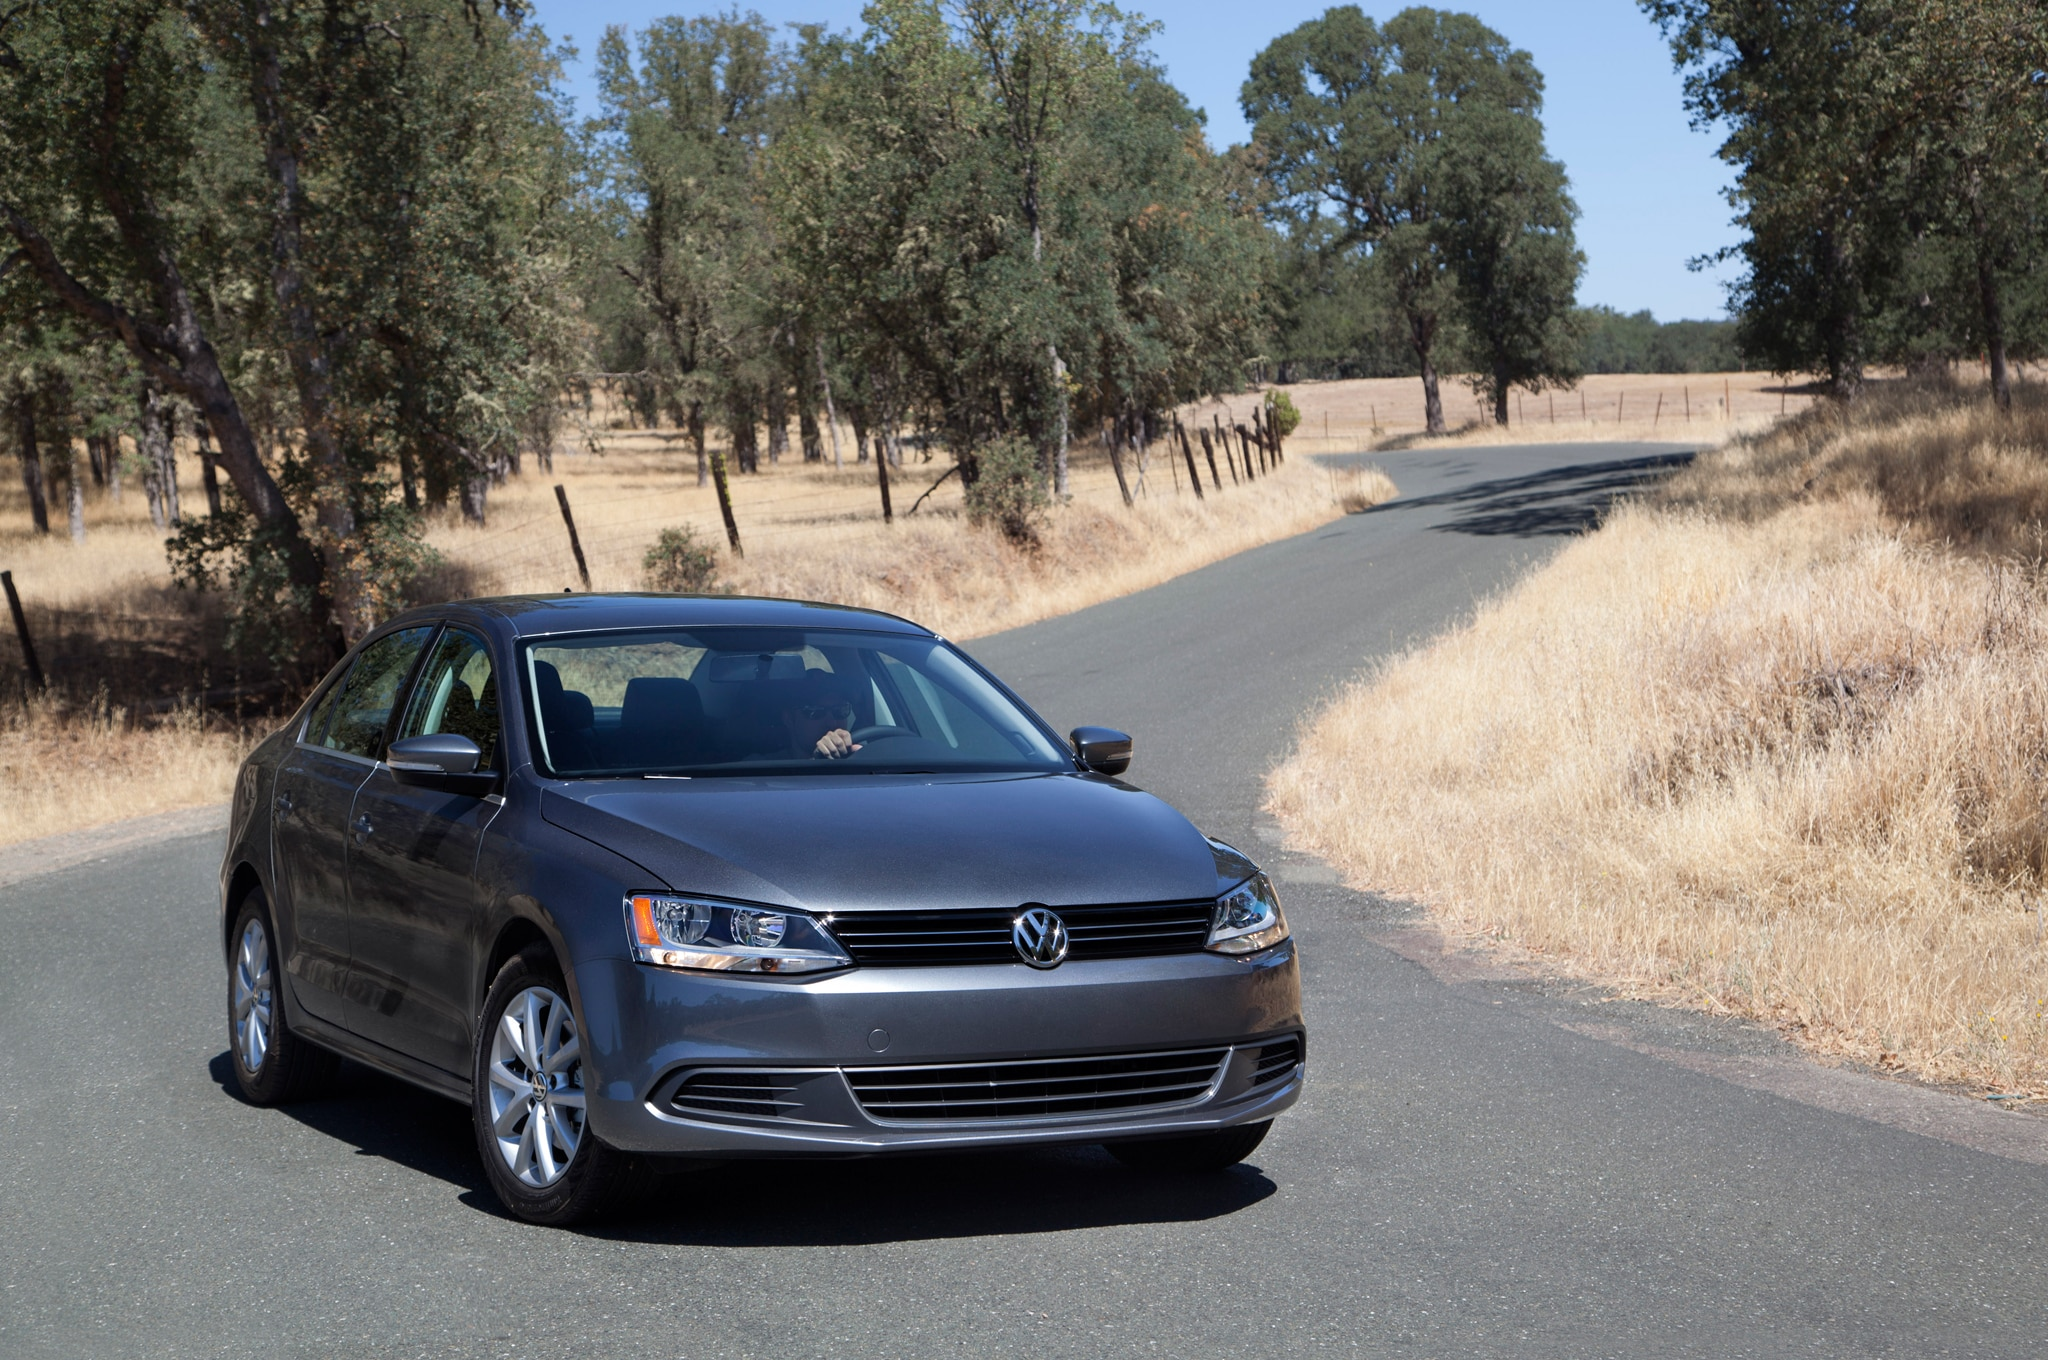 2014 Volkswagen Jetta Front End1